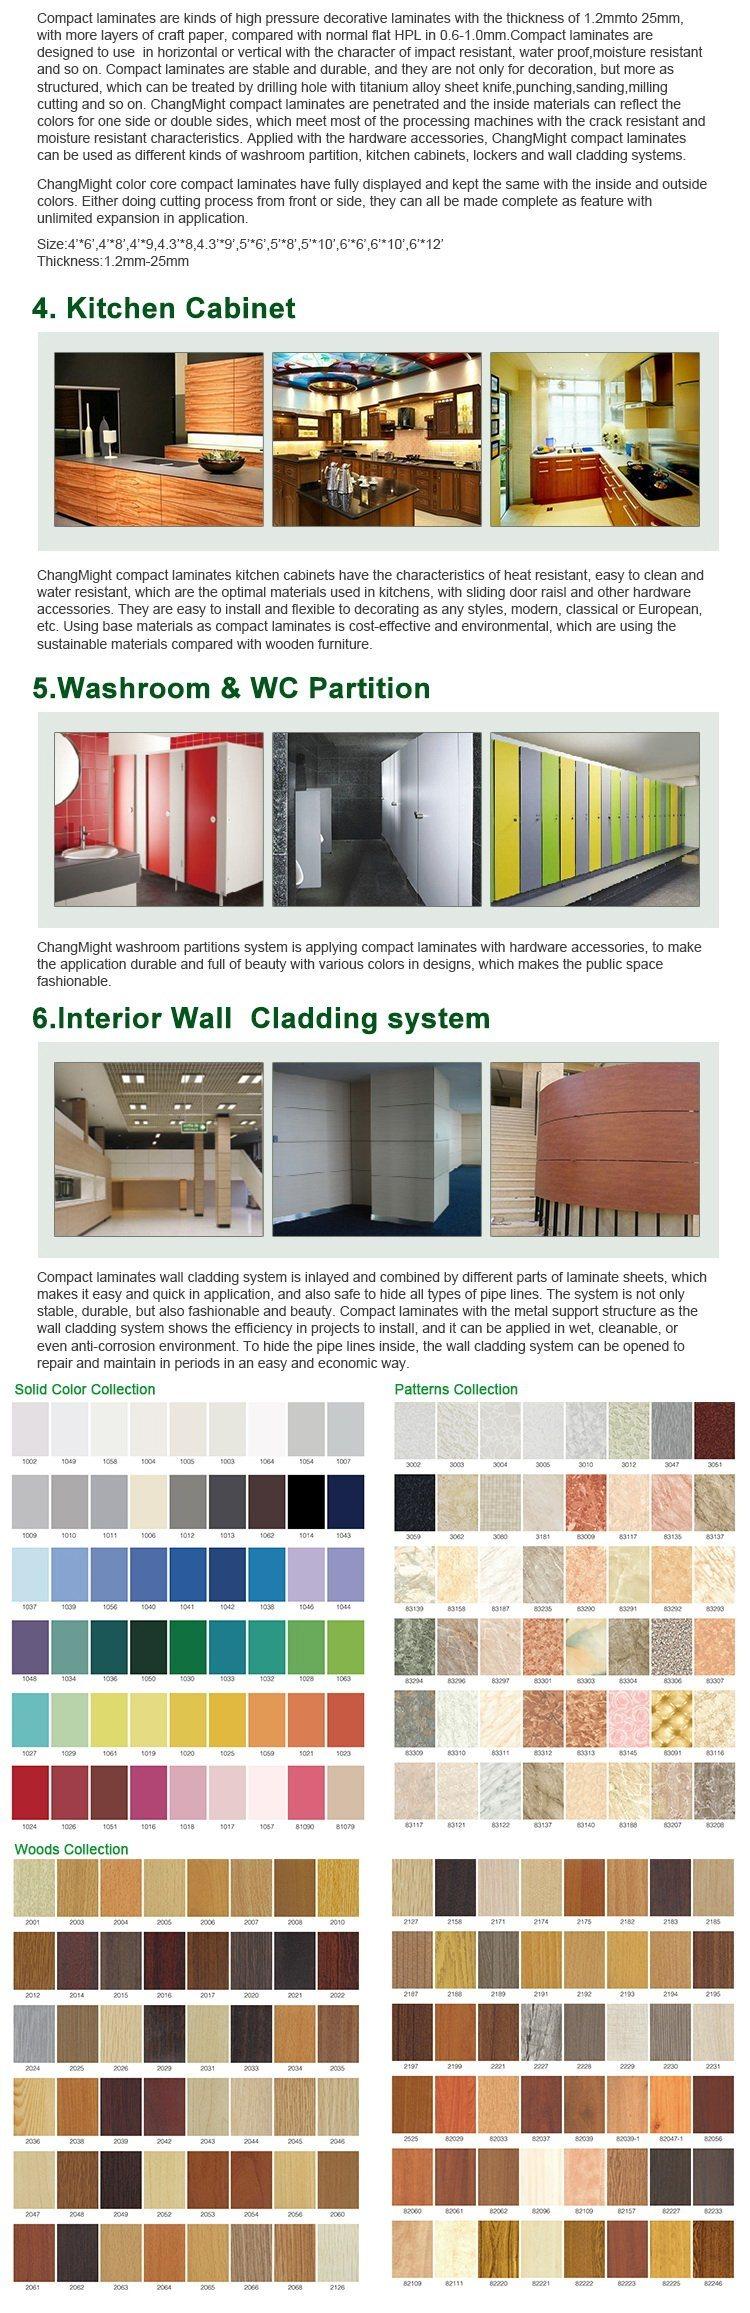 China formica wall panels high pressure laminate china for High pressure laminate kitchen cabinets